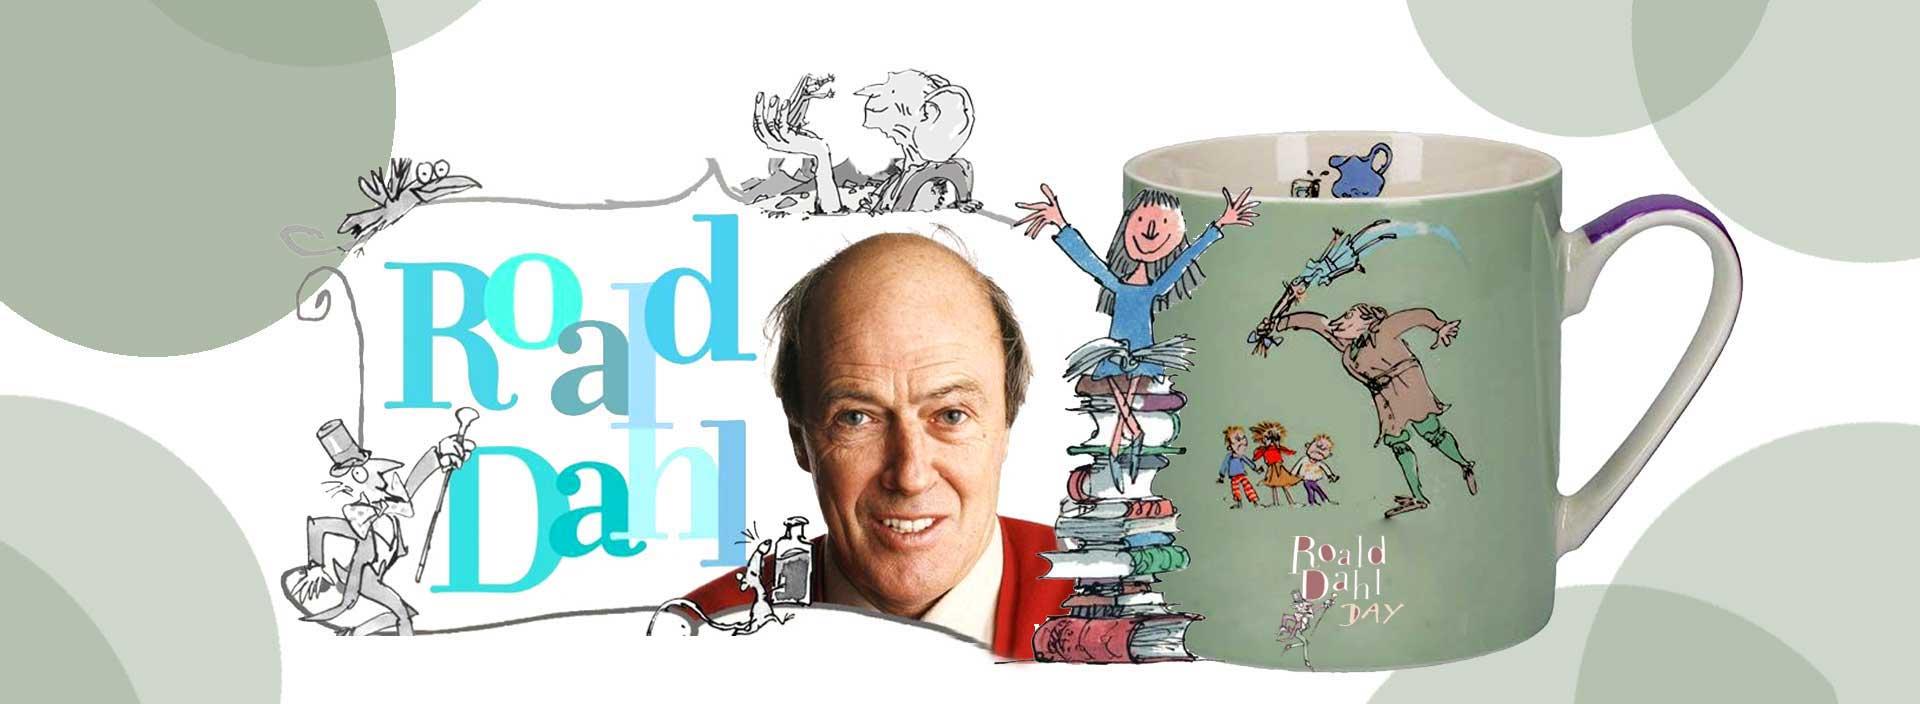 Roald Dahl 1 1 - رولد دال و غول ادبیات کودکان ، Roald Dahl